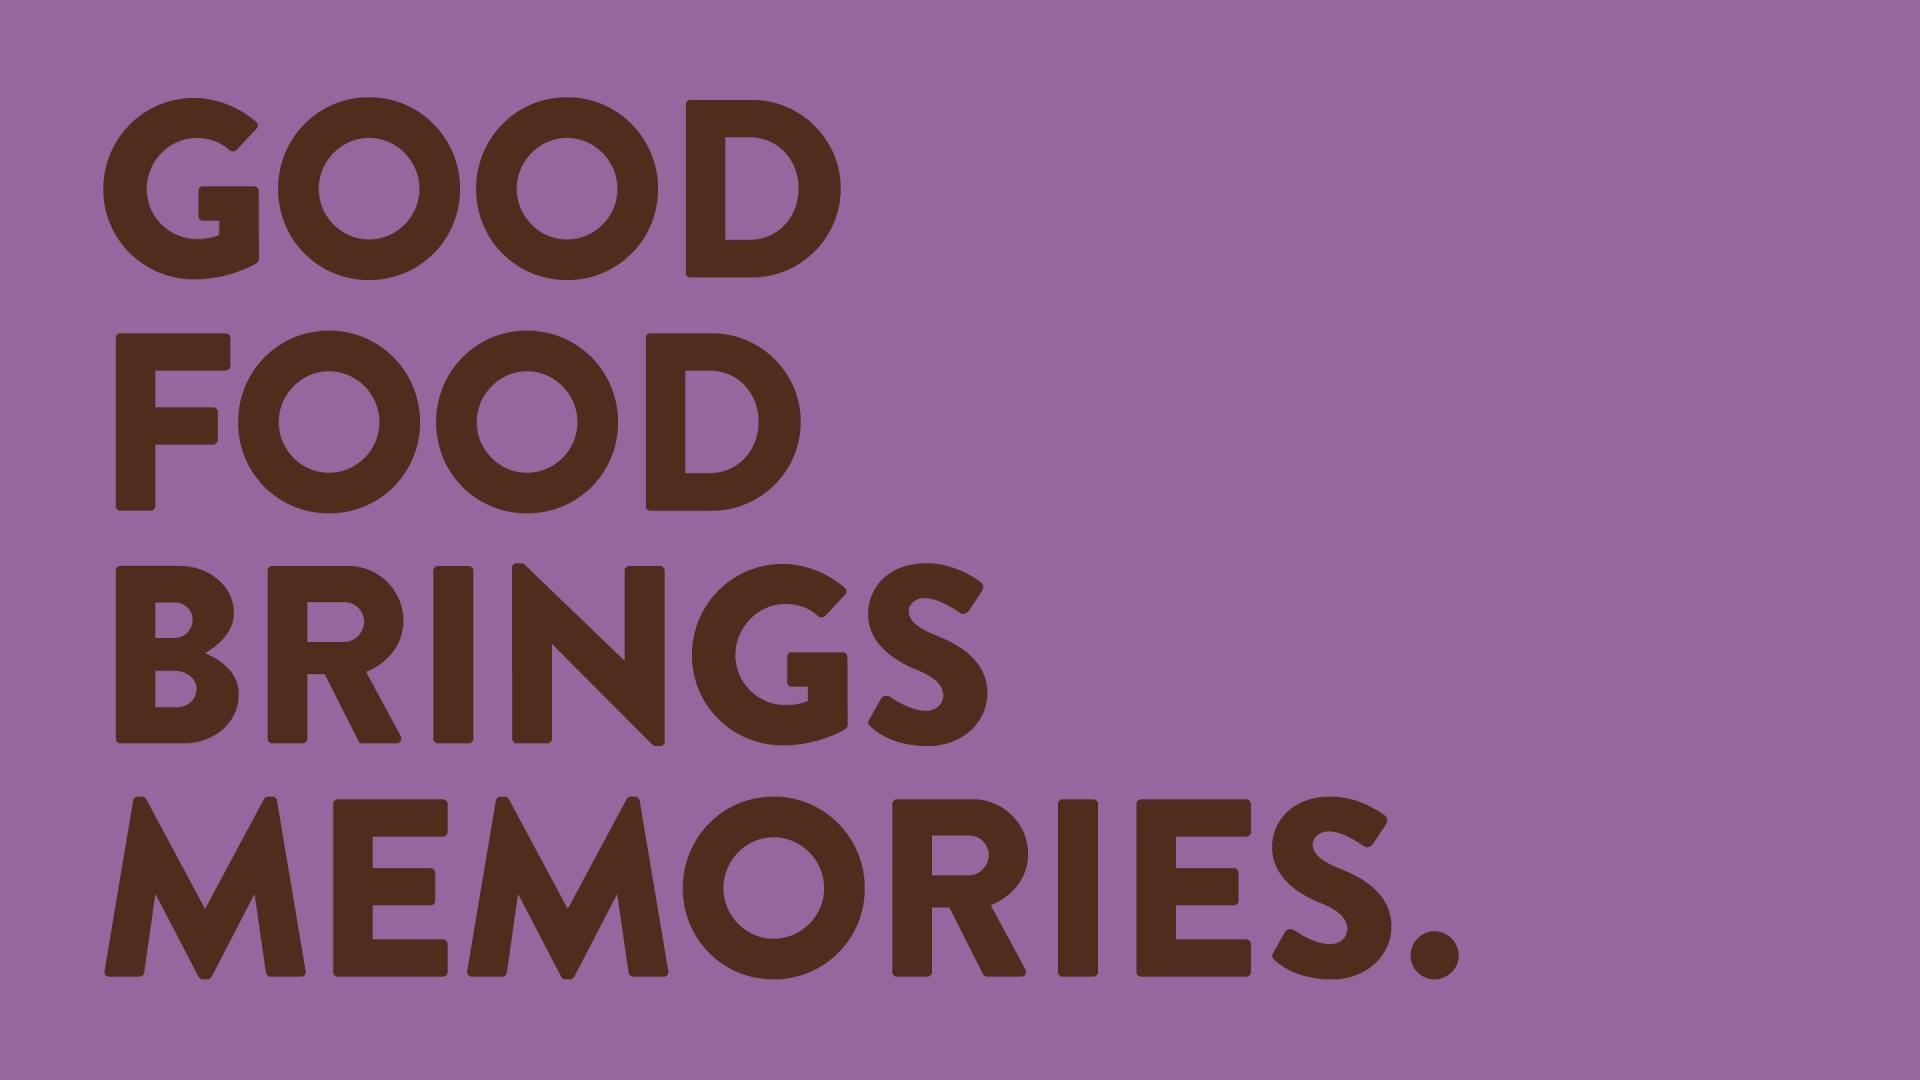 Cauldron brand messaging –good food brings memories